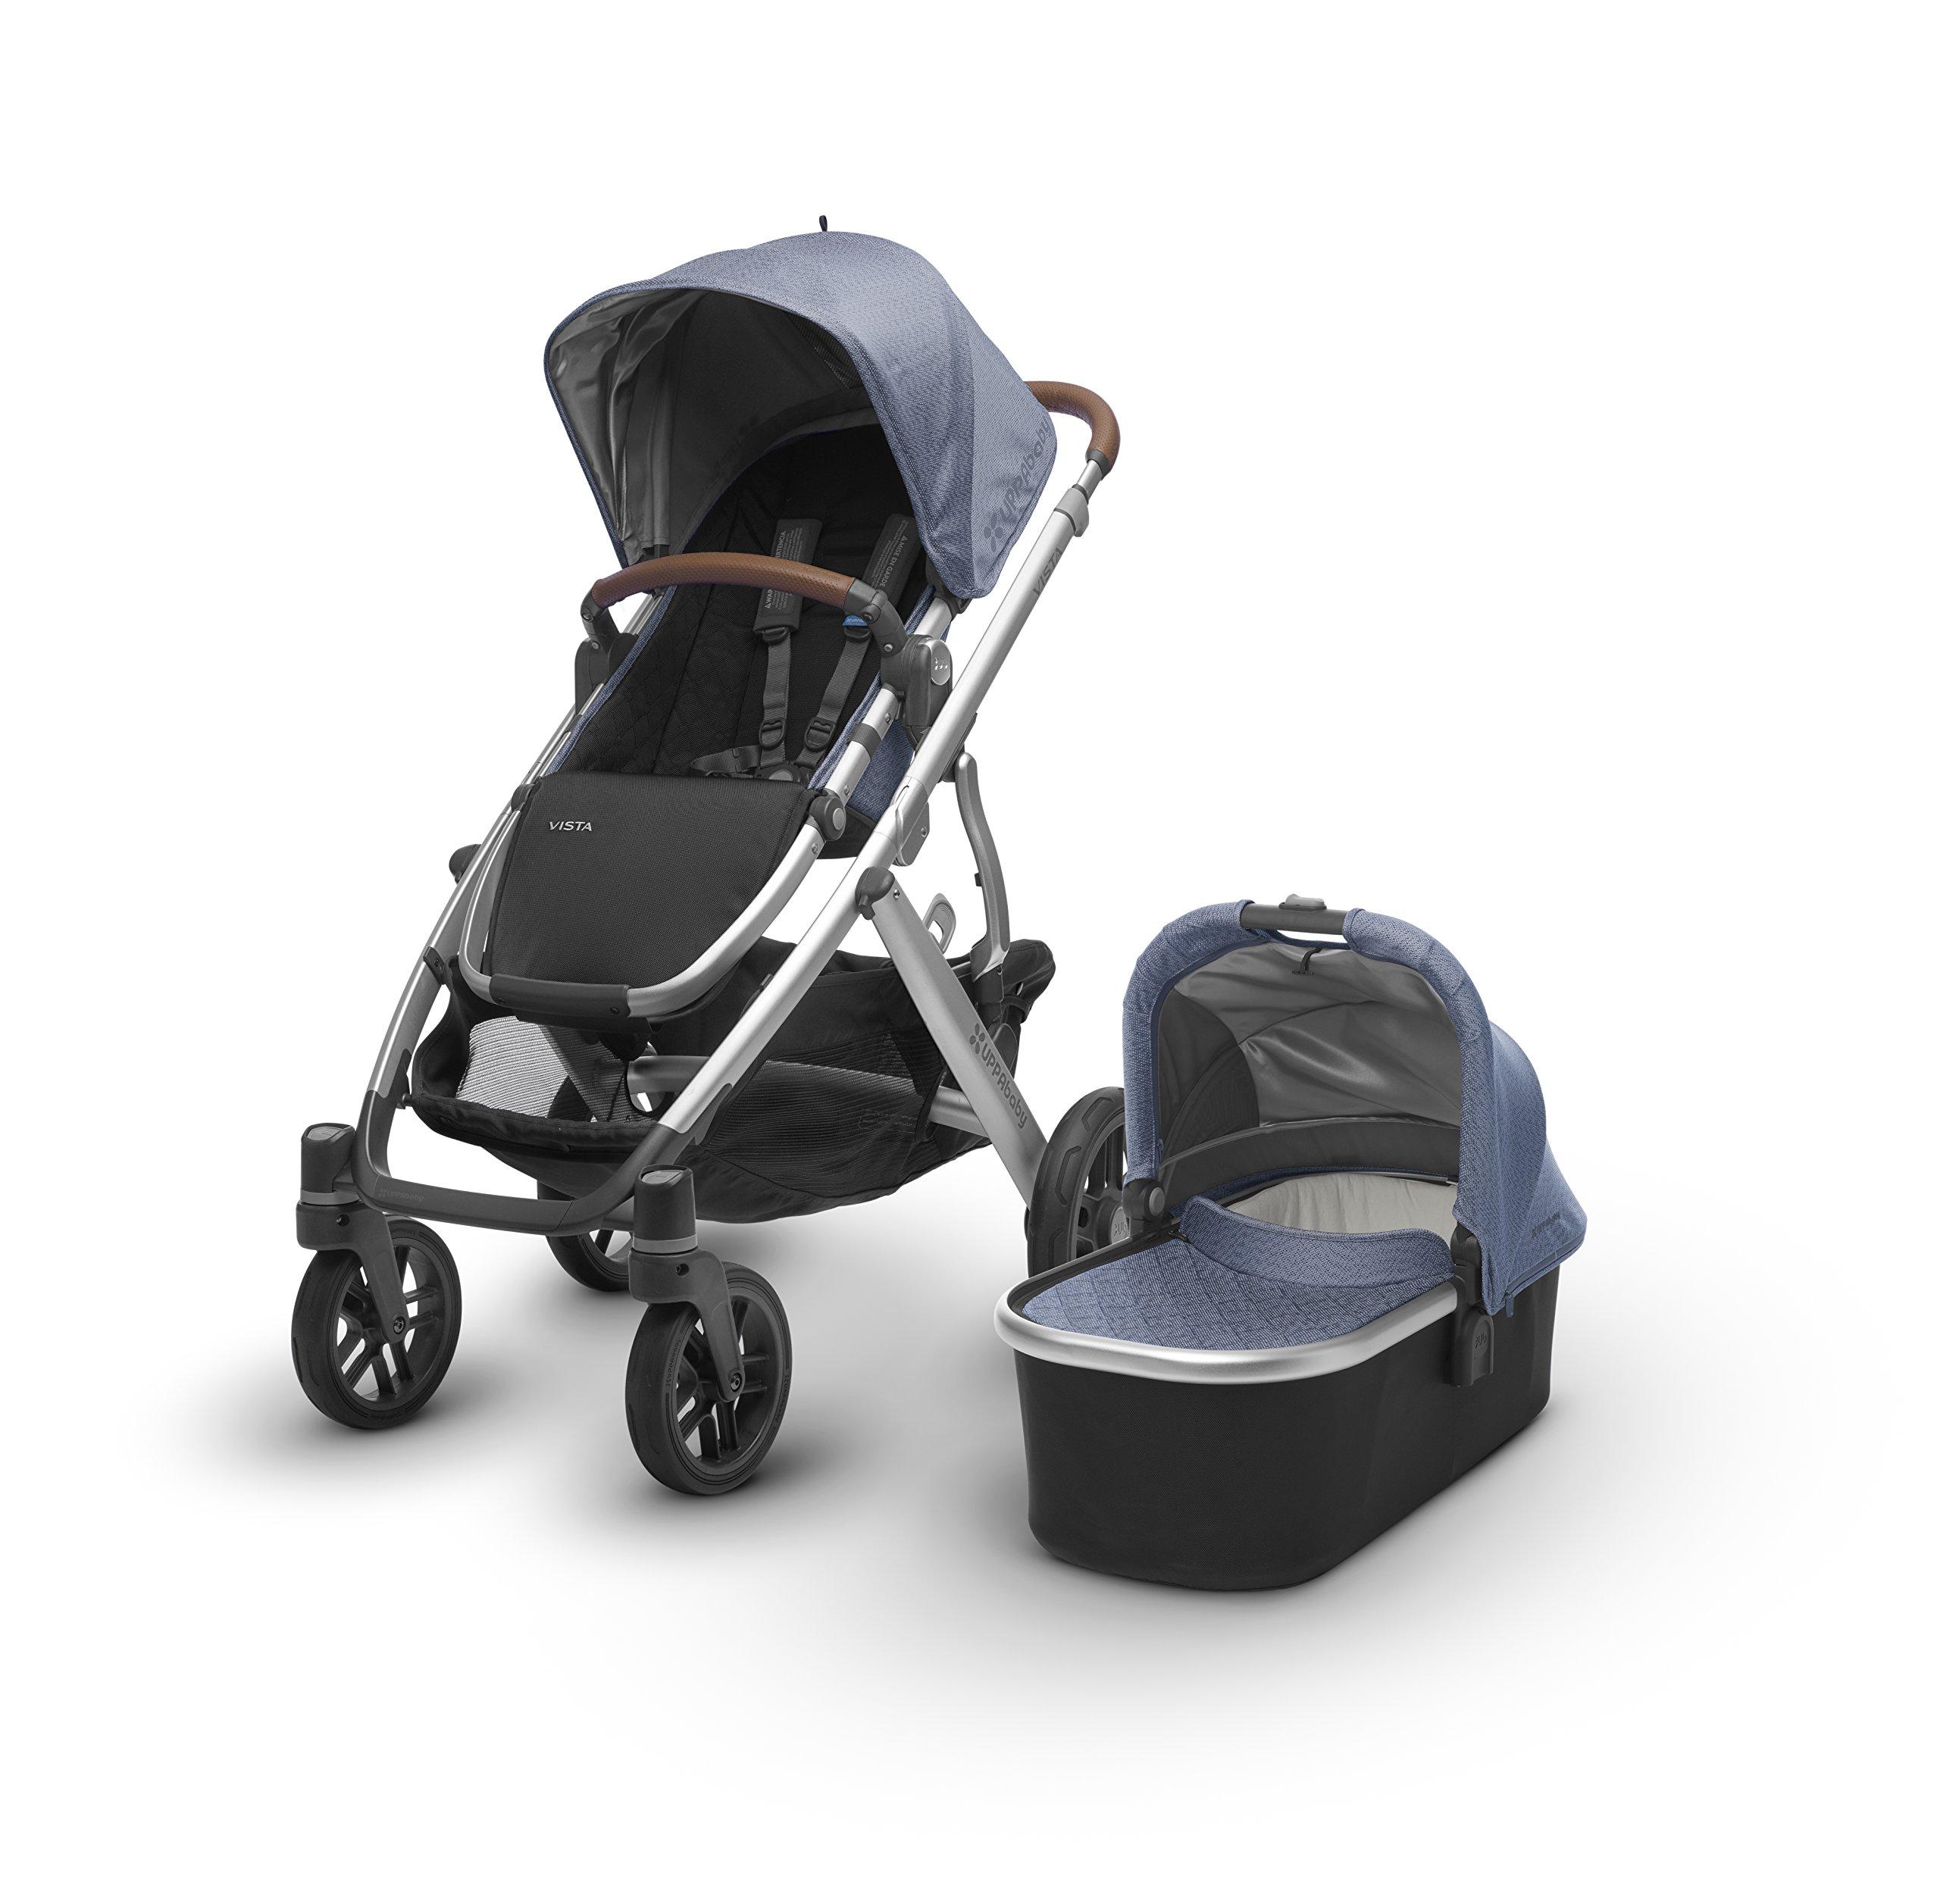 UPPAbaby VISTA Stroller, Blue Marl/Silver/Leather, Henry